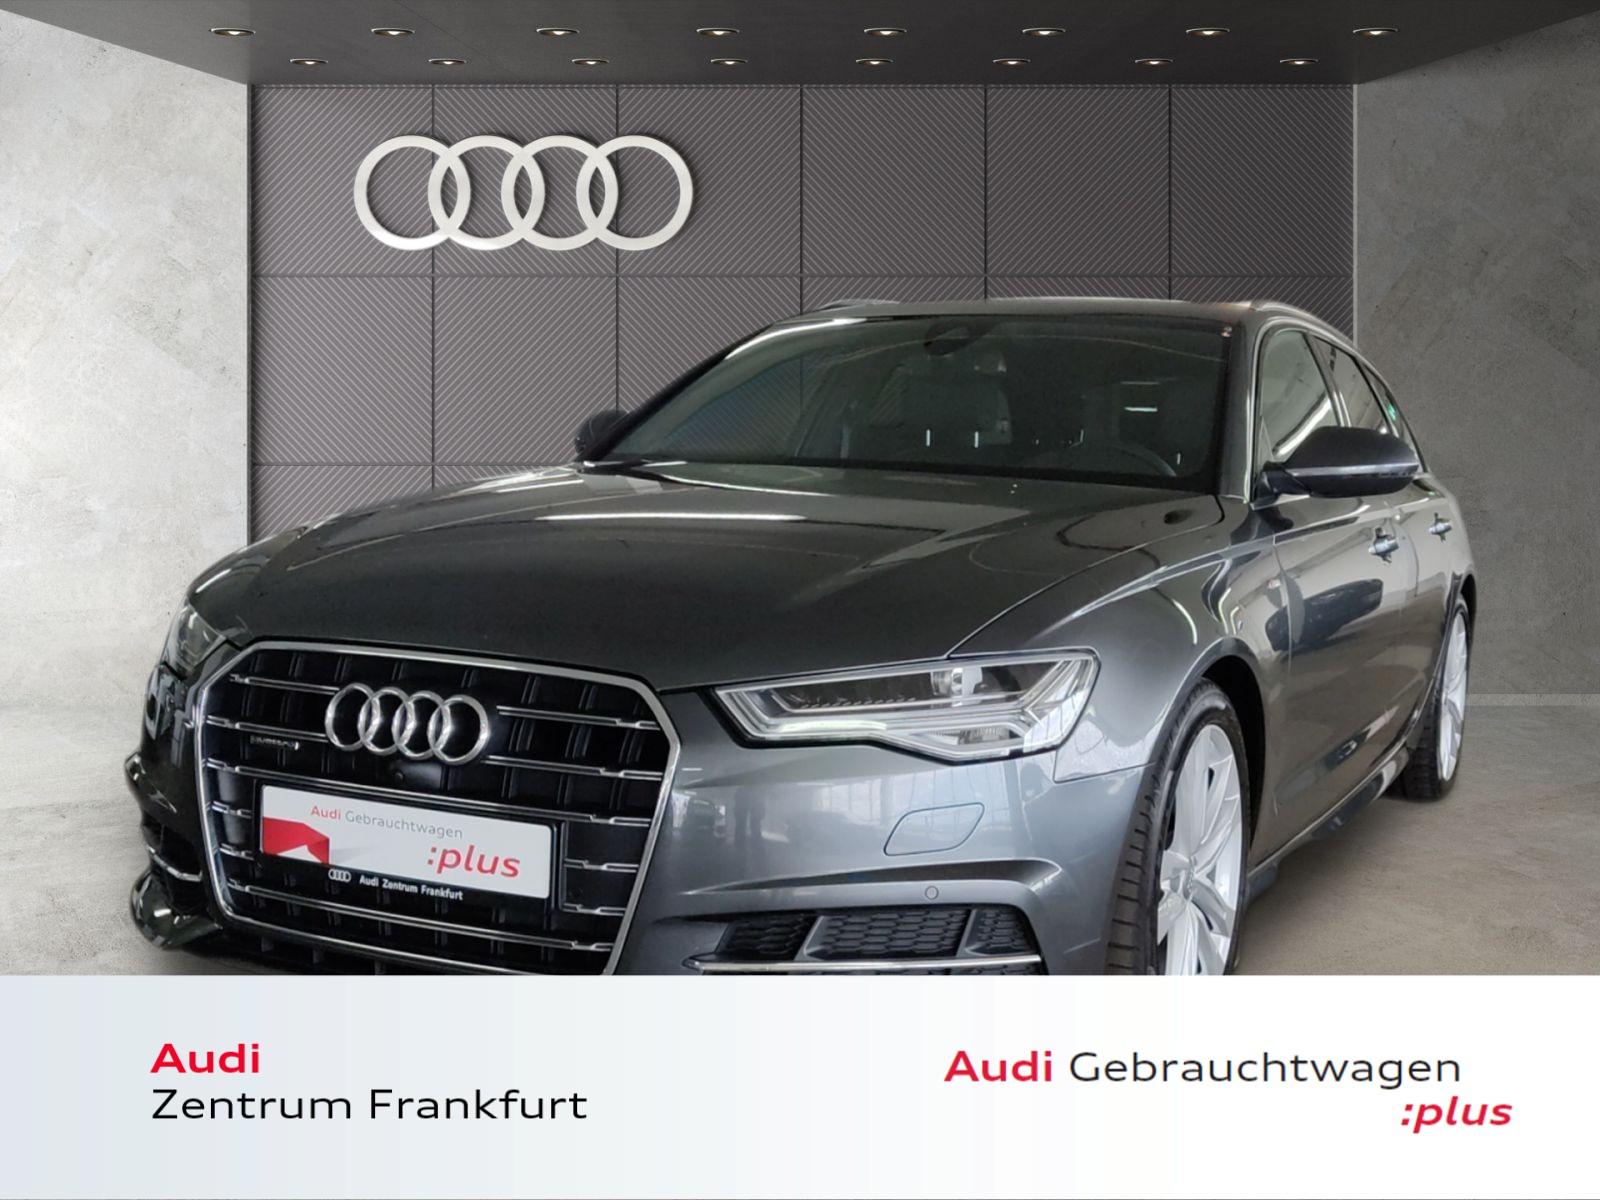 Audi A6 Avant 3.0 TDI quattro S tronic S line MatrixLED Navi Panorama Sitzheizung, Jahr 2018, Diesel